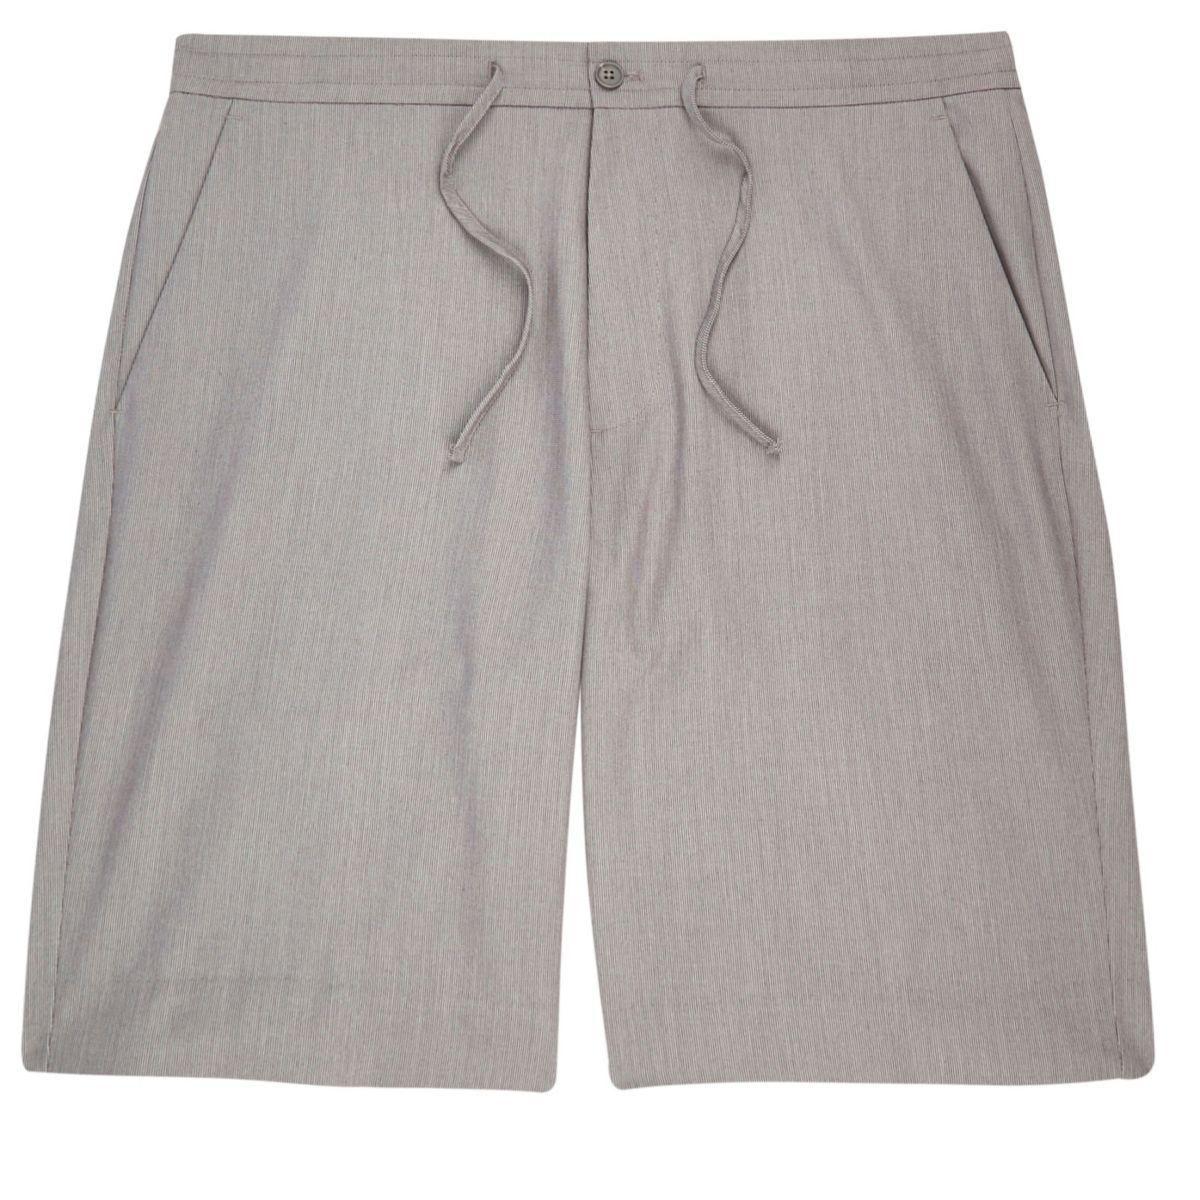 Grey drawstring casual bermuda shorts